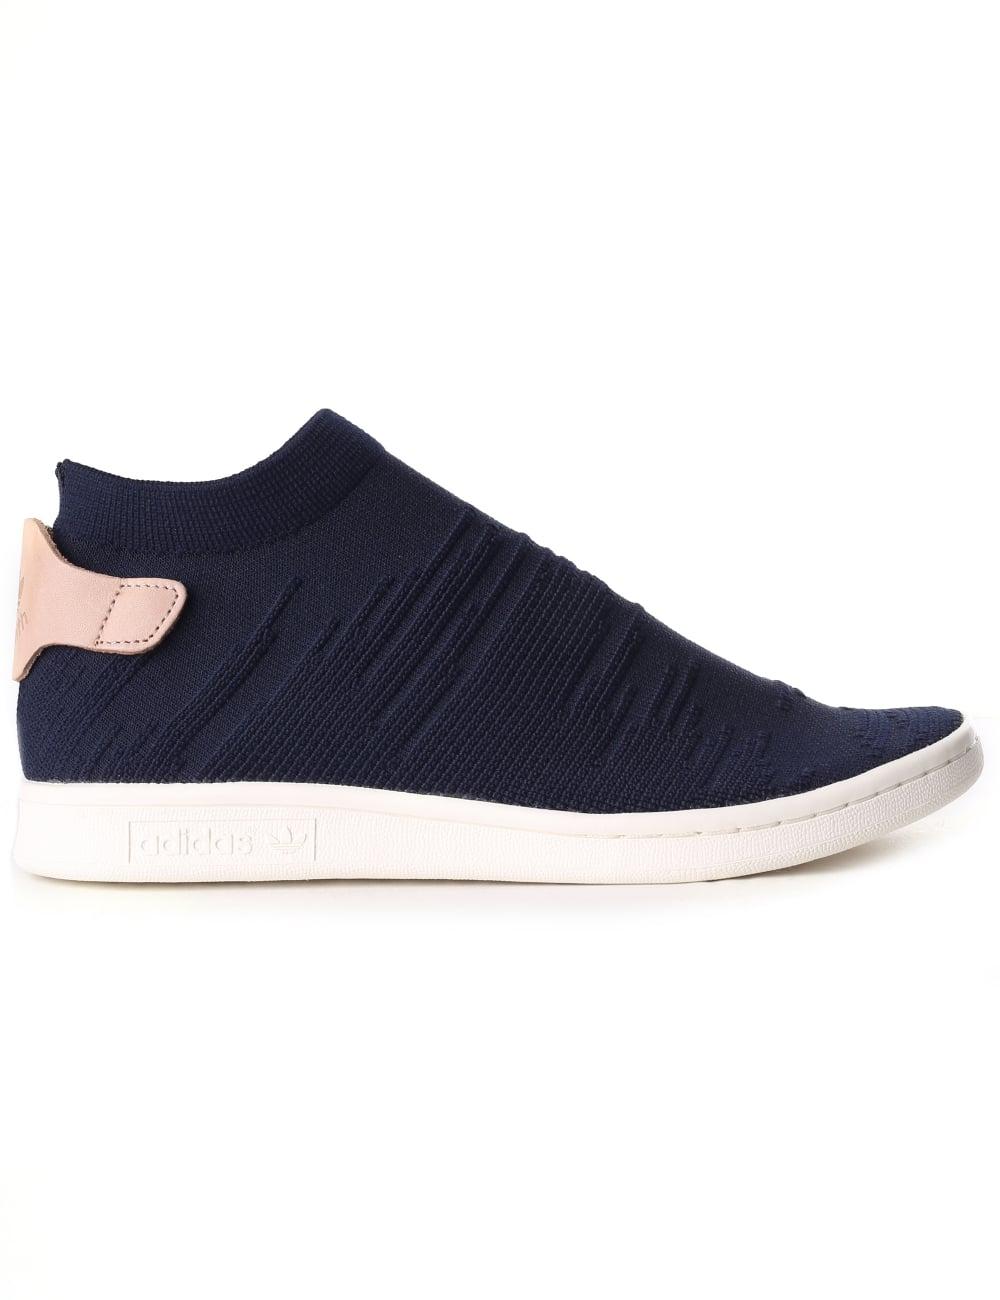 Adidas Women s Stan Smith Sock Primeknit Shoes a0049c0938